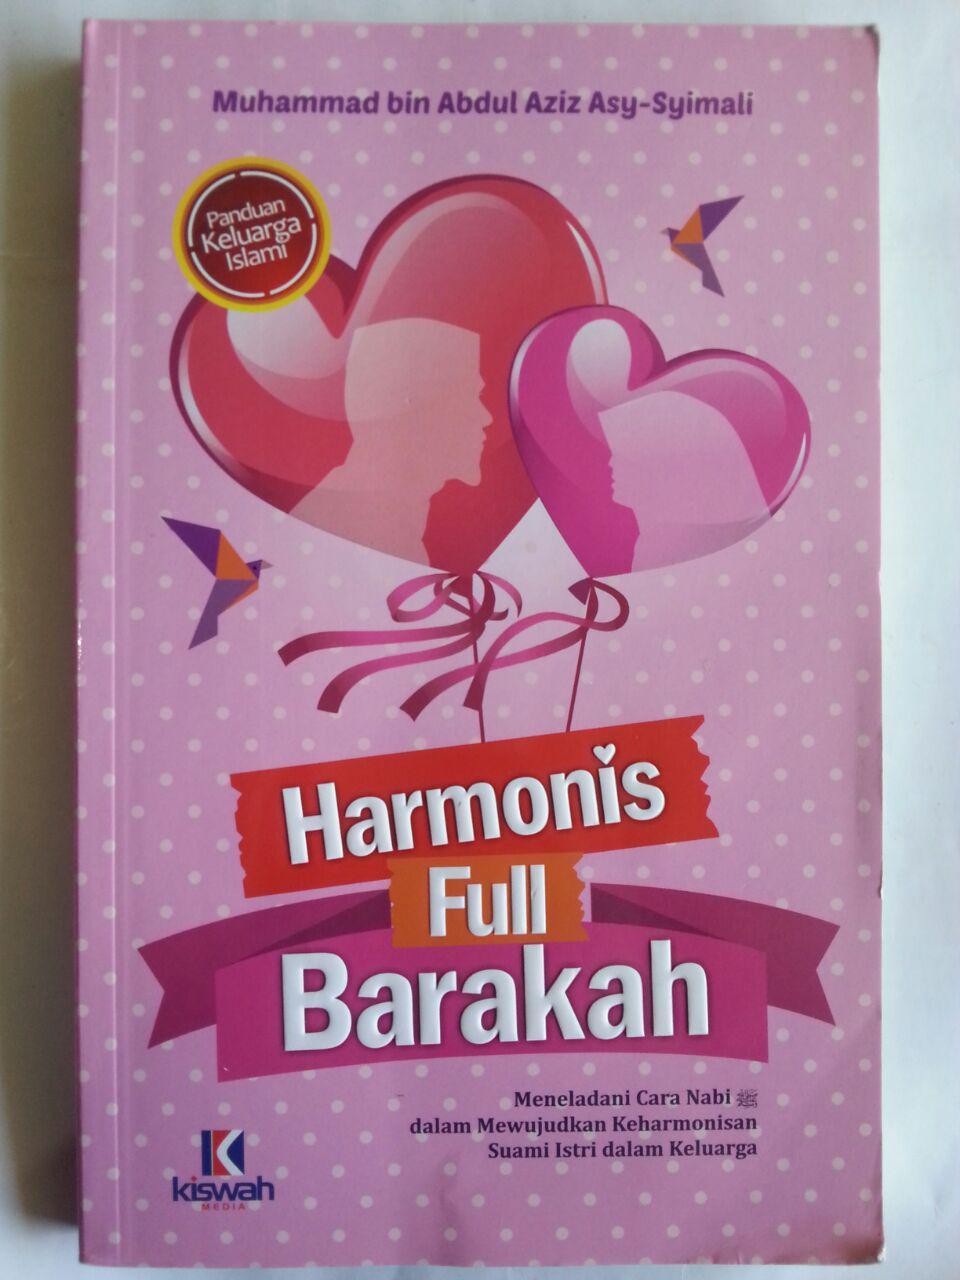 Buku Harmonis Full Barakah Cara Nabi Mewujudkan Keharmonisan cover 2